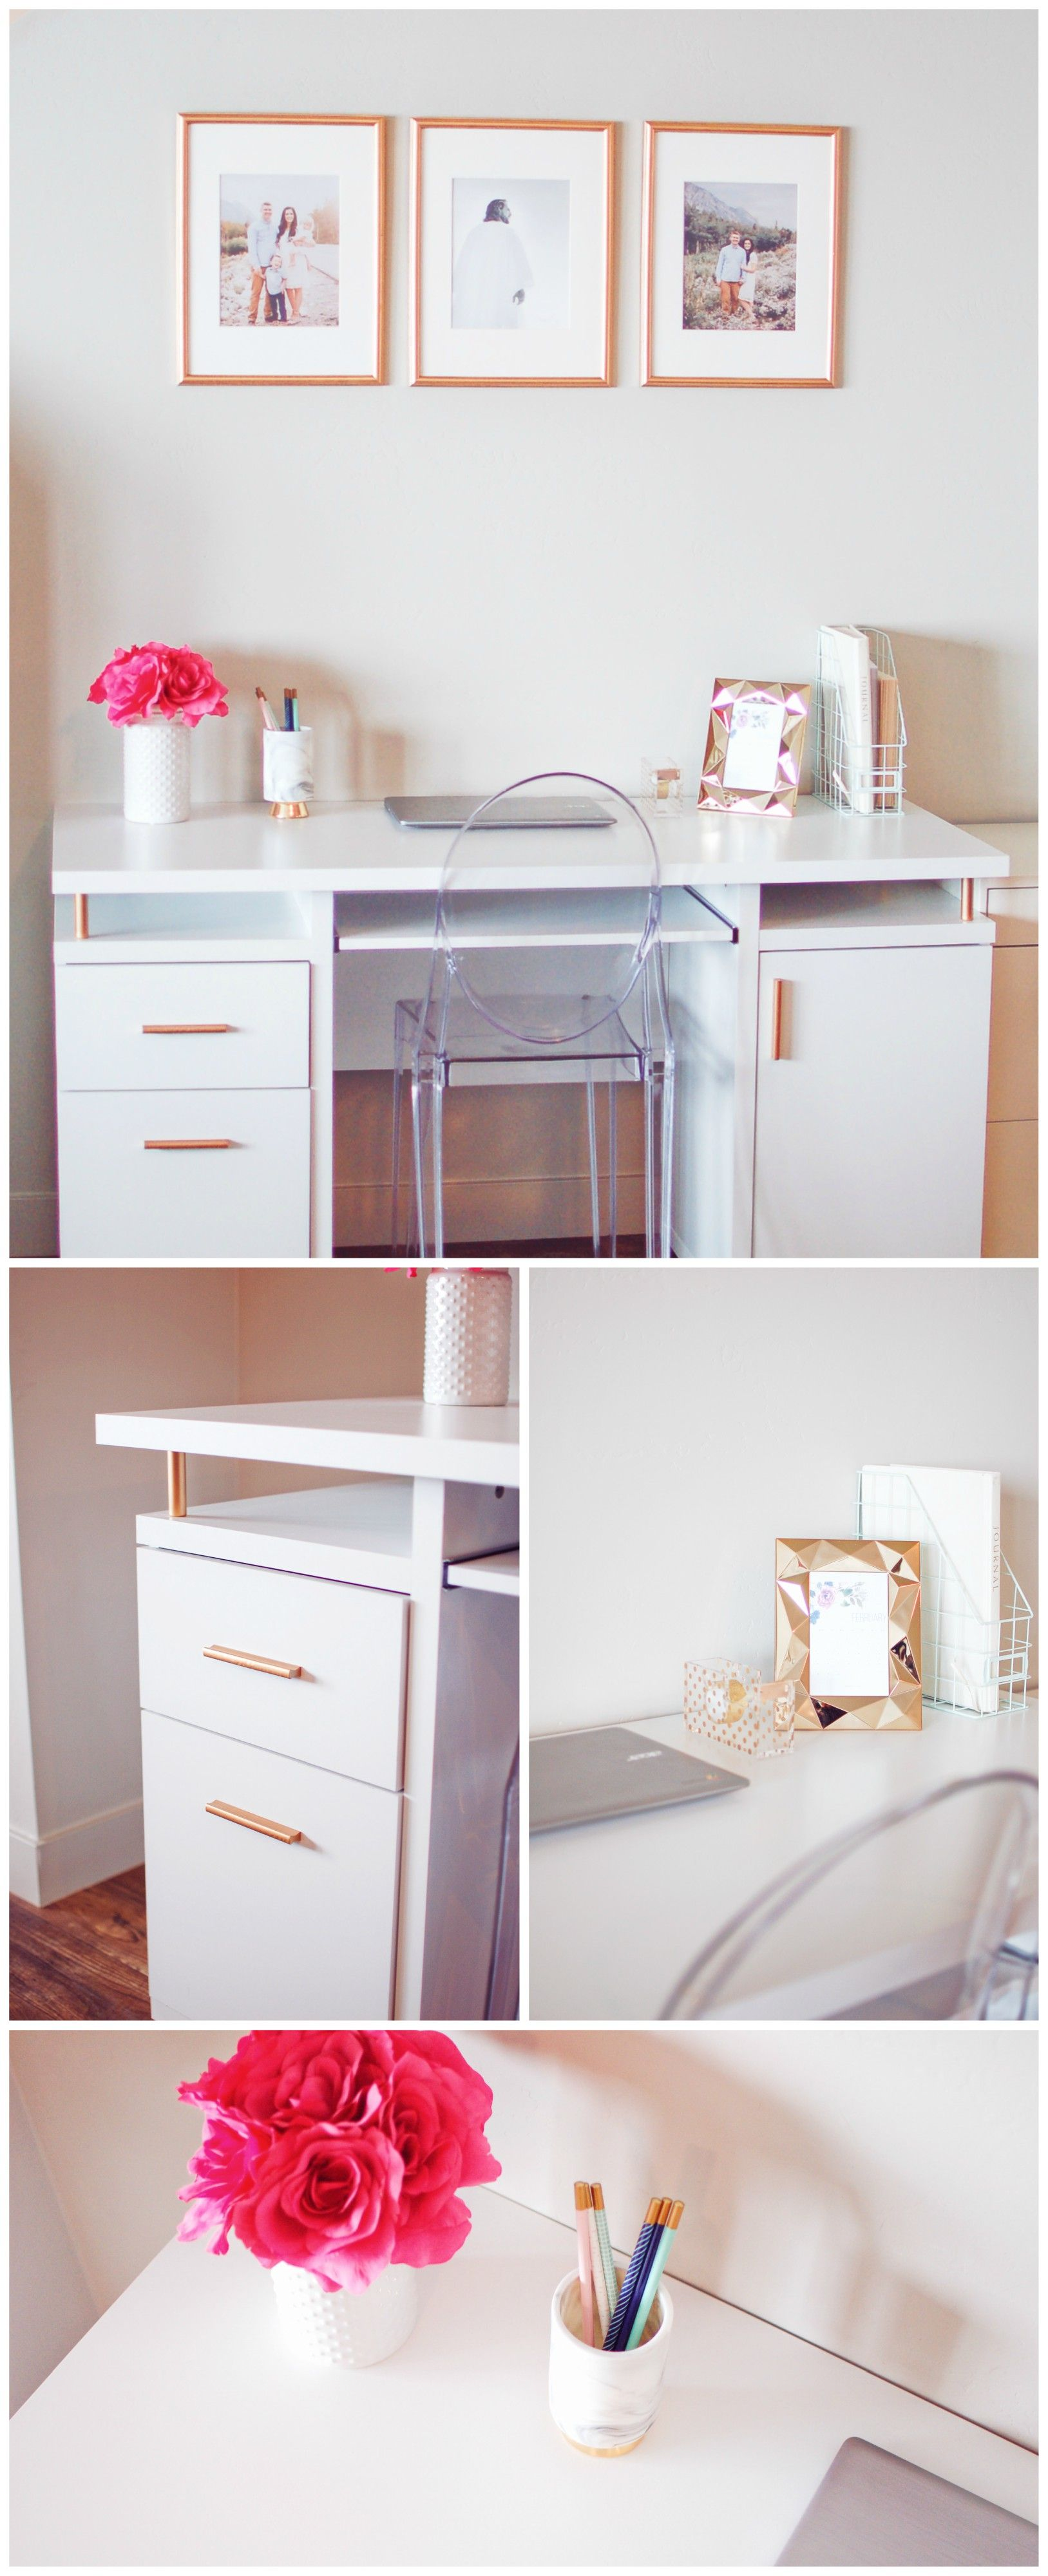 pinterest img like organization lily desk rosegold marble diy decor tips giveaway